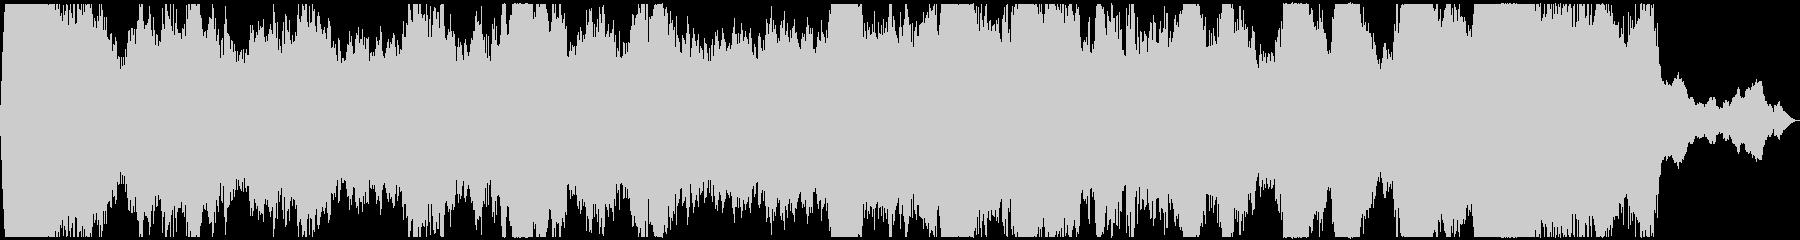 PADS 低音01の未再生の波形